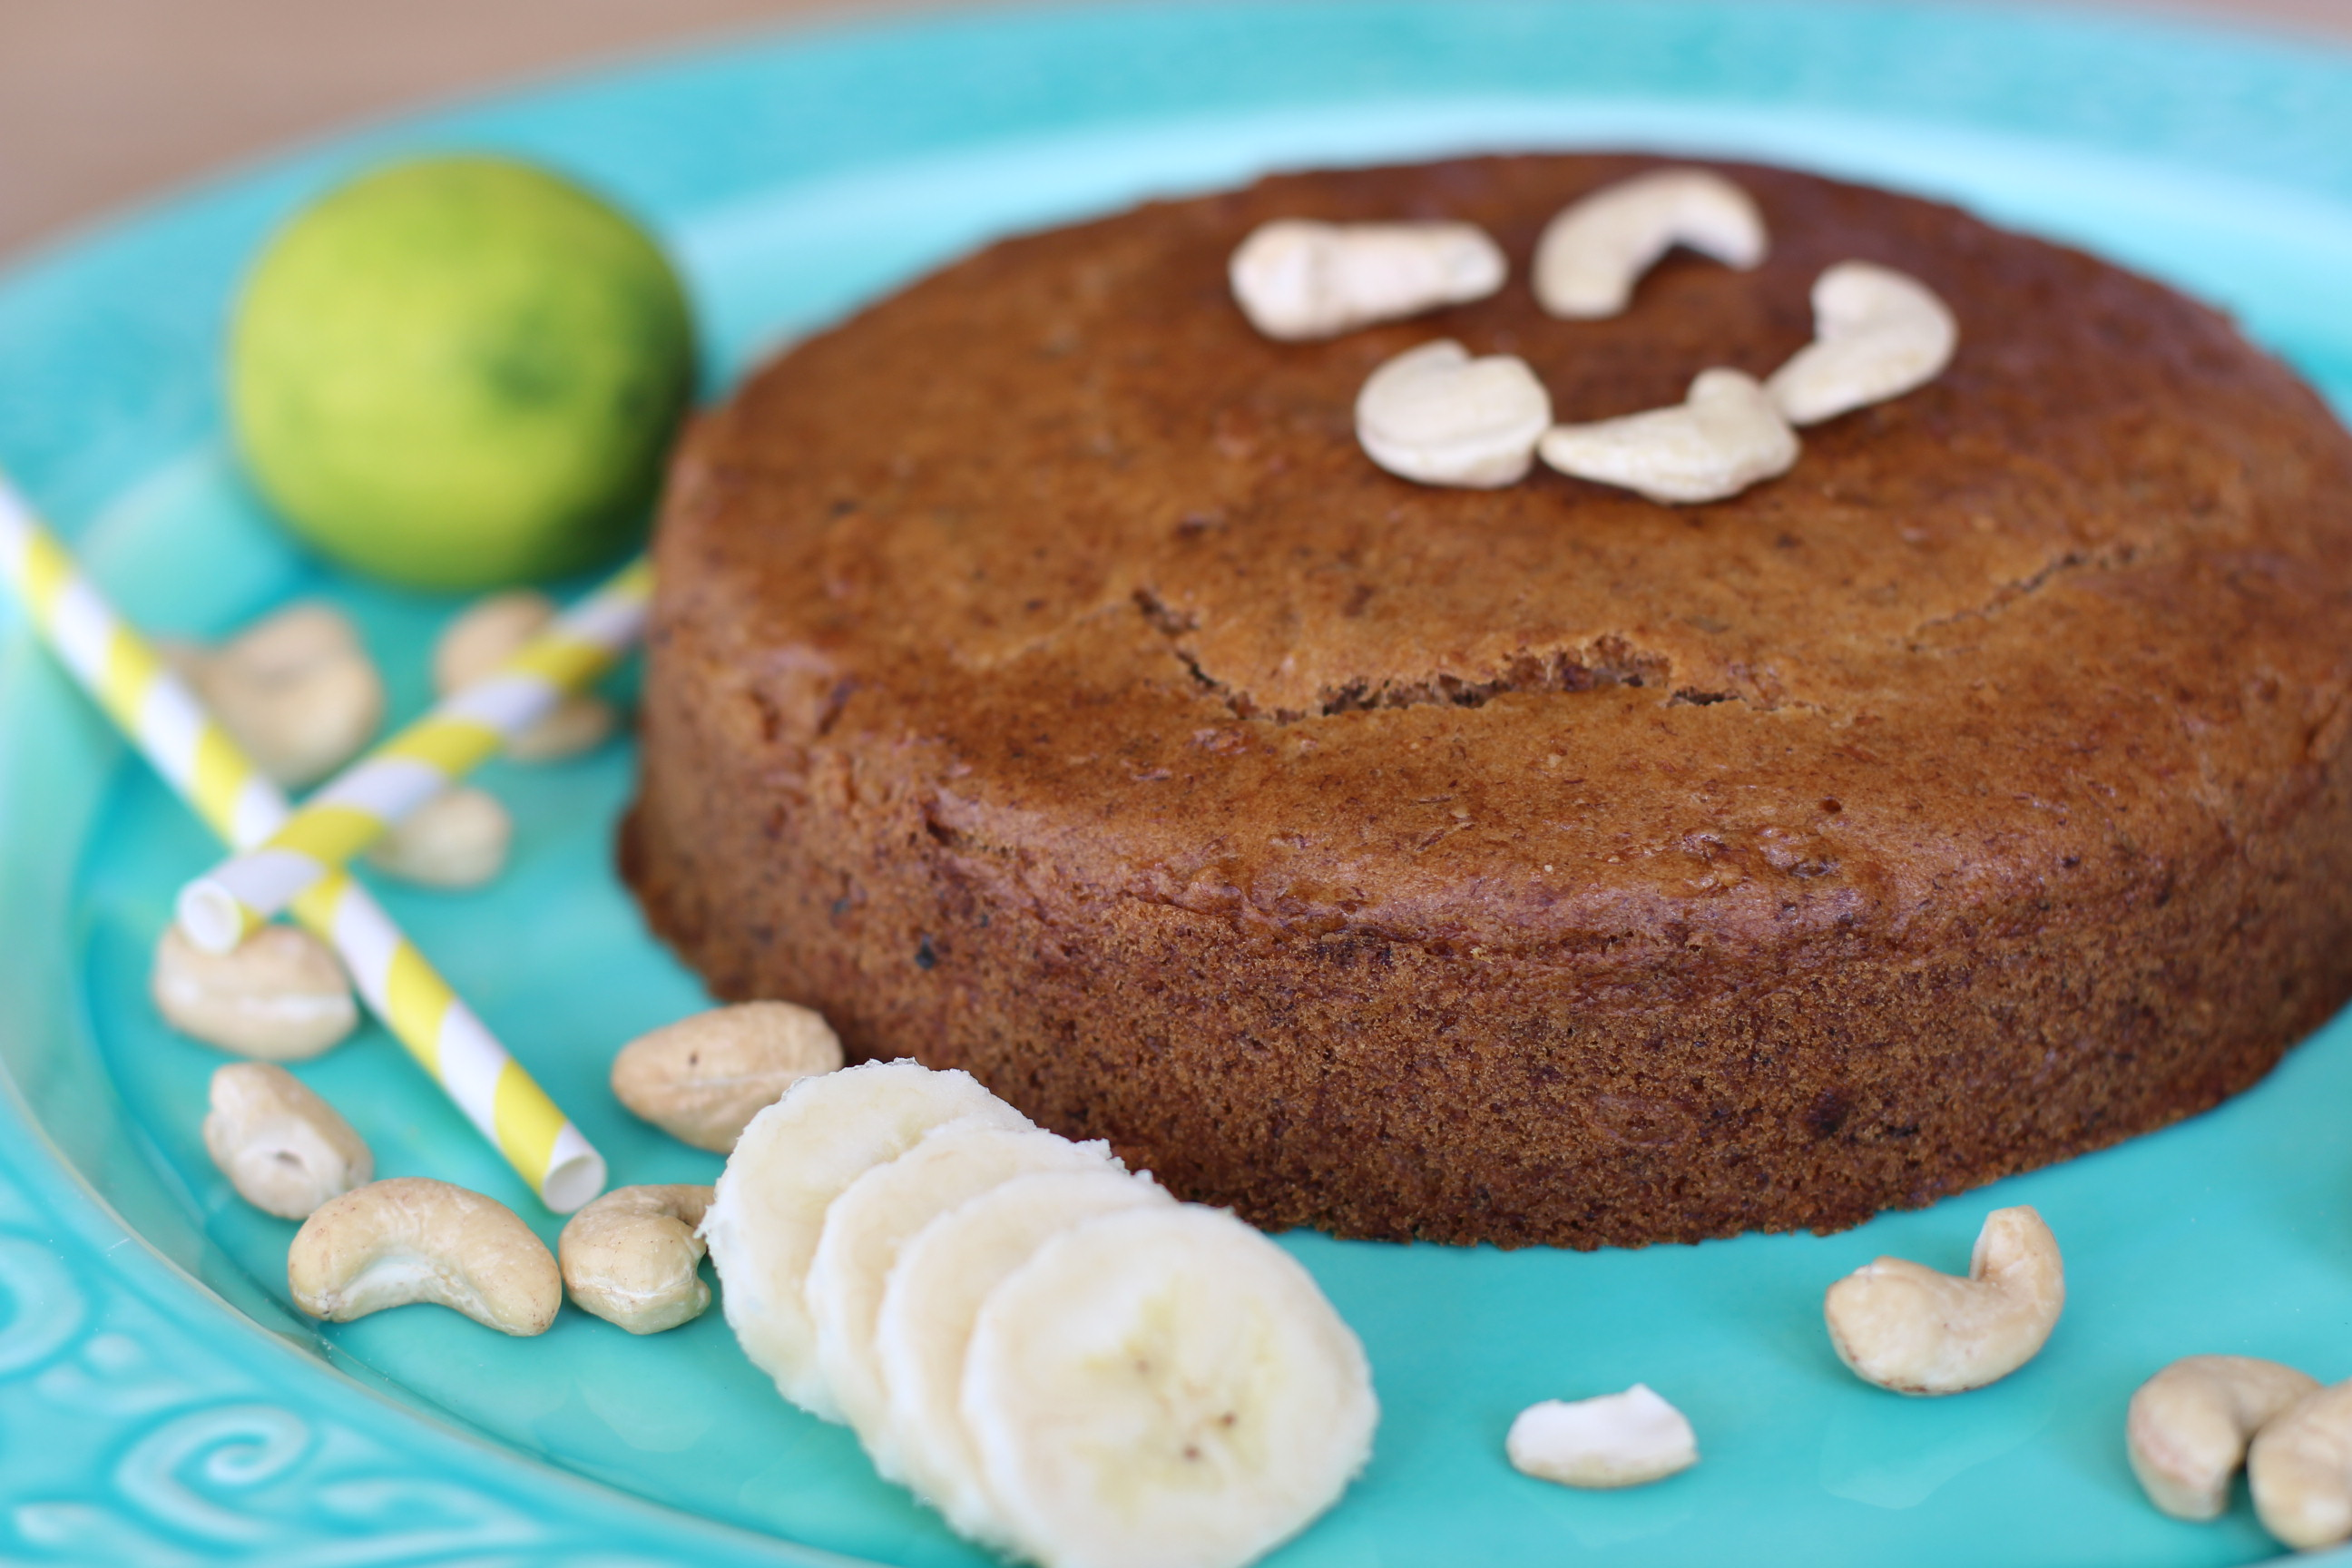 Banane-Nuss-Kuchen | Cleanes Banana Bread vegan